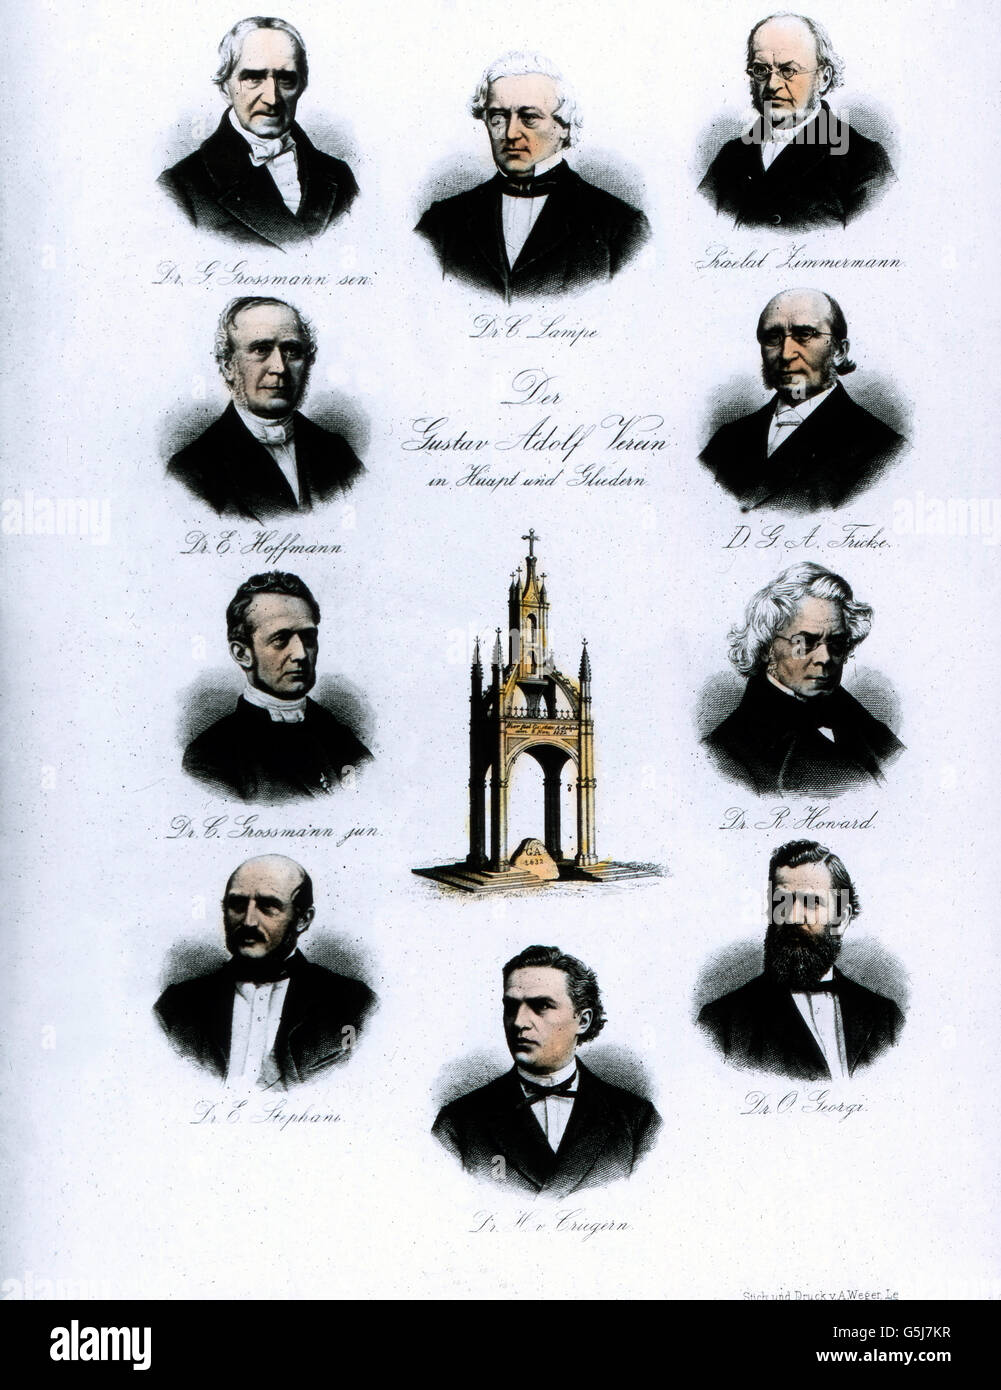 Berühmte Männer des Gustav Adolf Vereins aus dem Jahre 1882. Famous men of the Gustav Adolf association - Stock Image